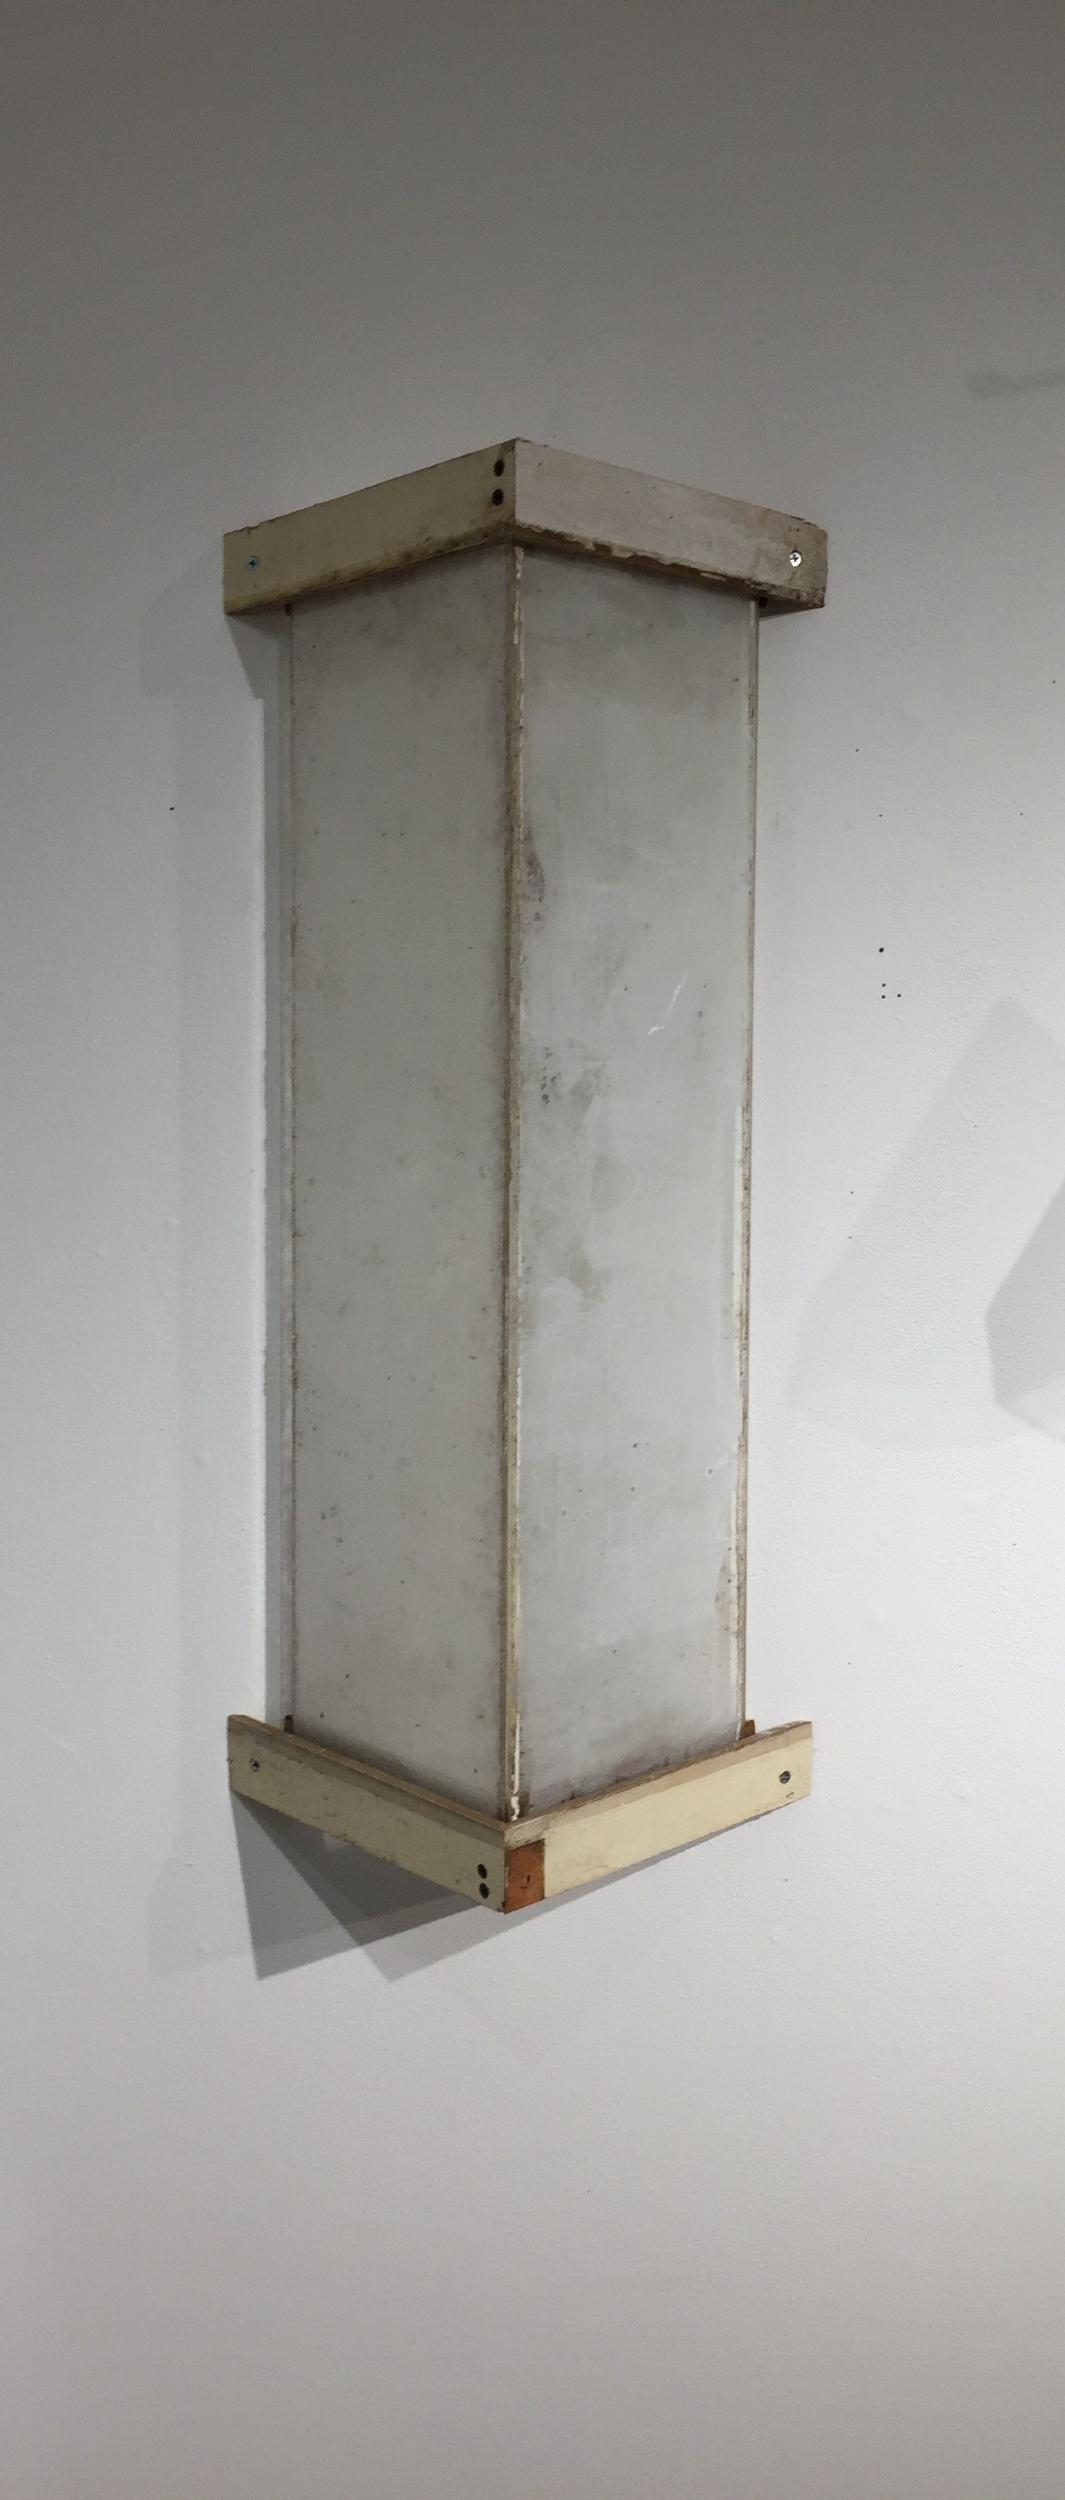 Window pane with serigraph